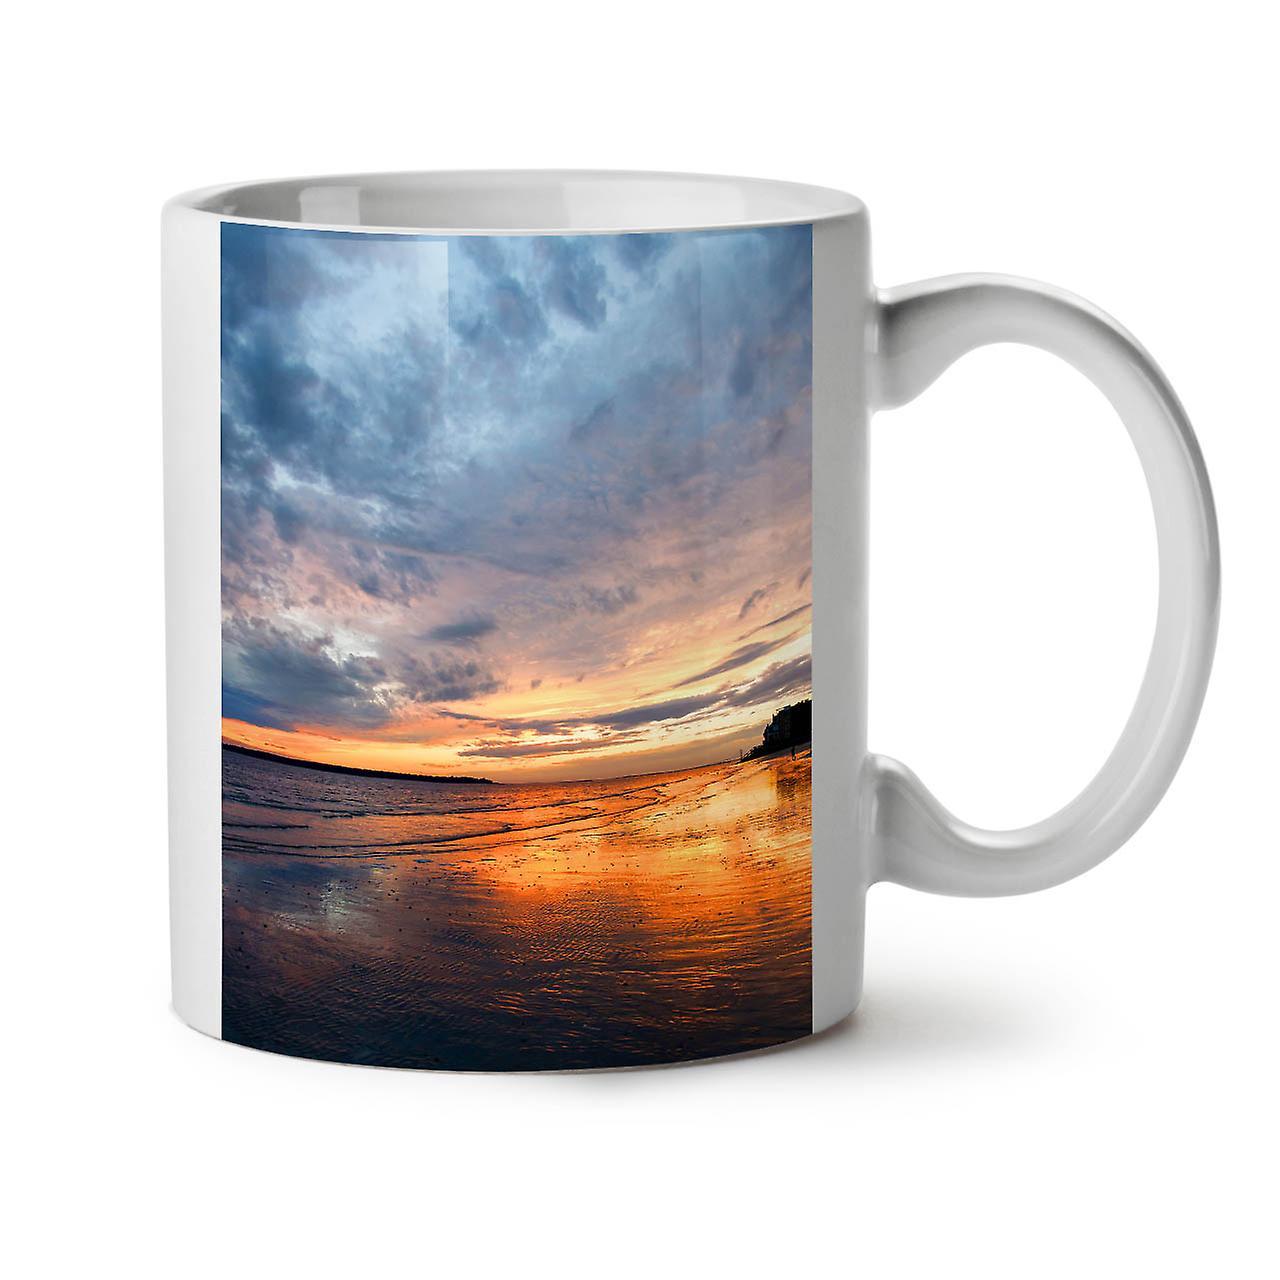 Sea OzWellcoda Nouveau 11 Thé Deep Café Tasse Sunset Blanc Céramique ulK3T5F1Jc